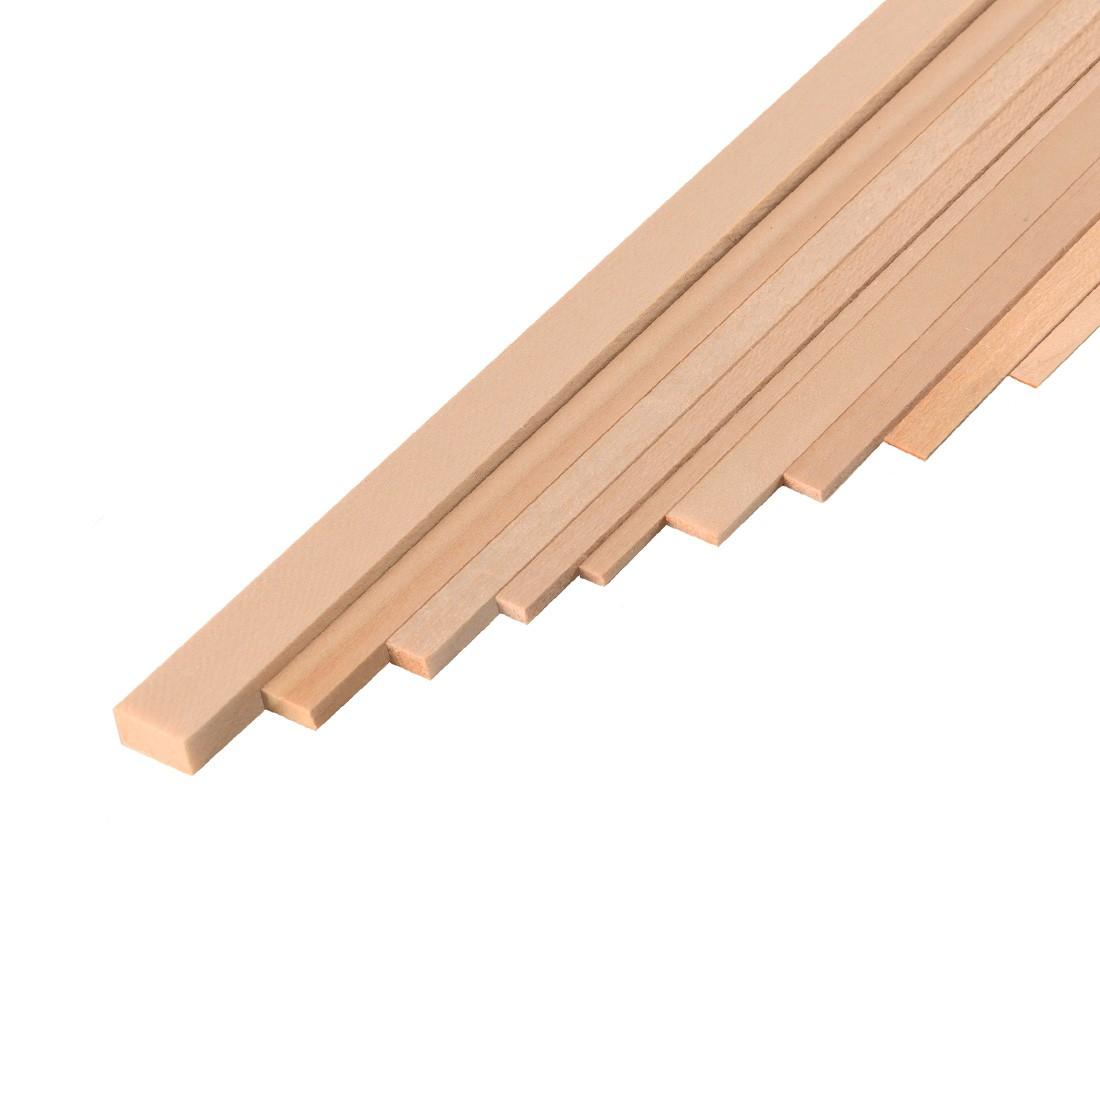 Listelli Tiglio   mm.0,5x8